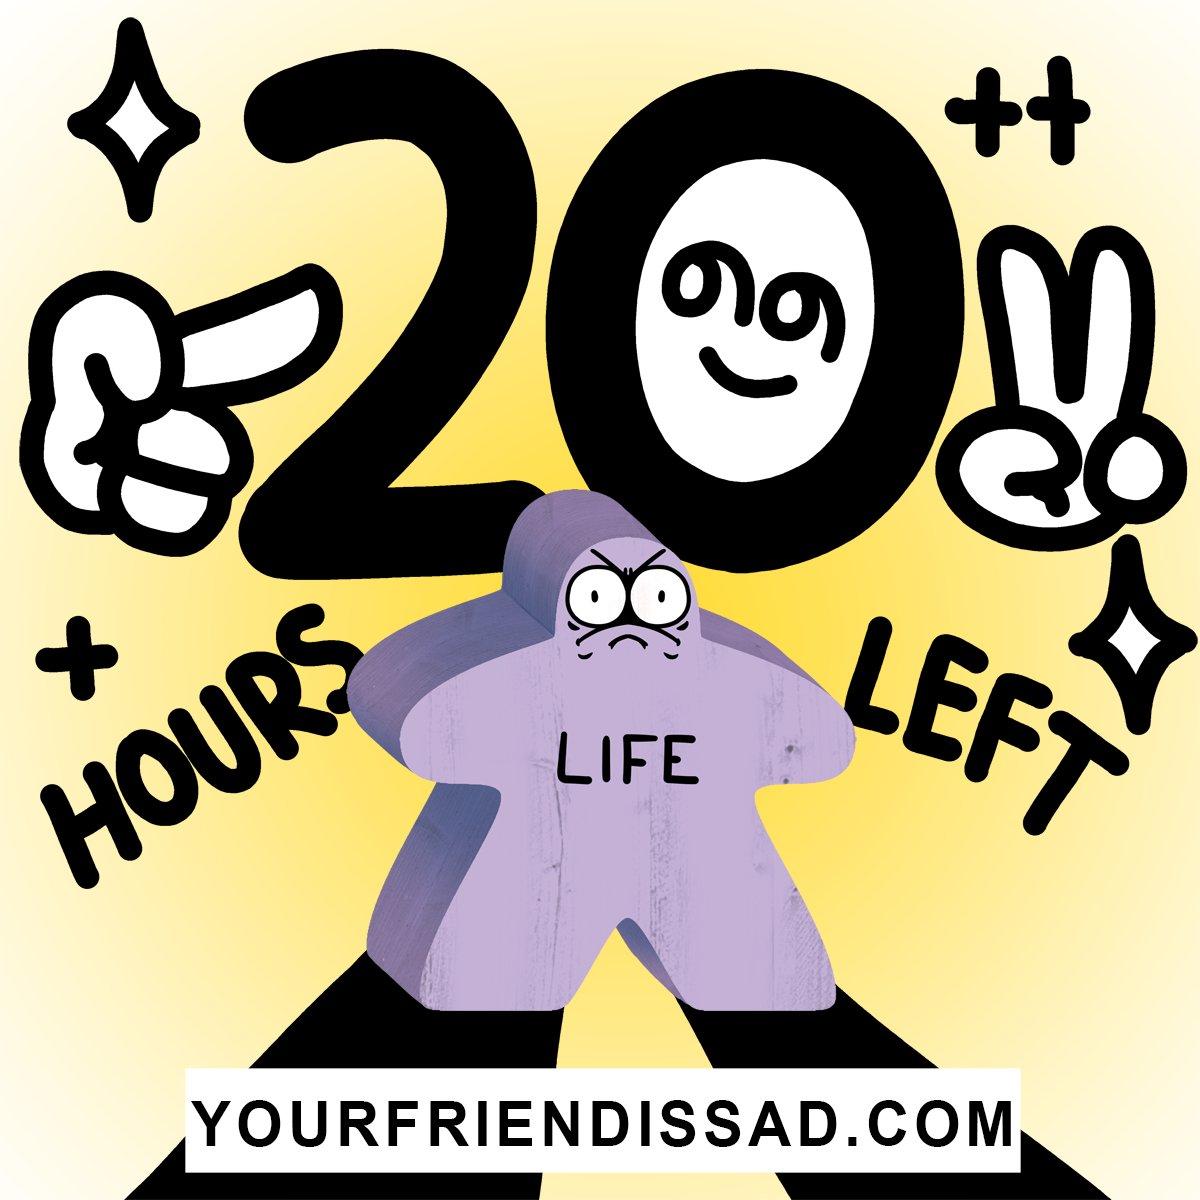 𝗗𝗔𝗪𝗡 𝗢𝗙 𝗧𝗛𝗘 𝗟𝗔𝗦𝗧 𝗗𝗔𝗬. 20 hours remain: kickstarter.com/projects/drink…